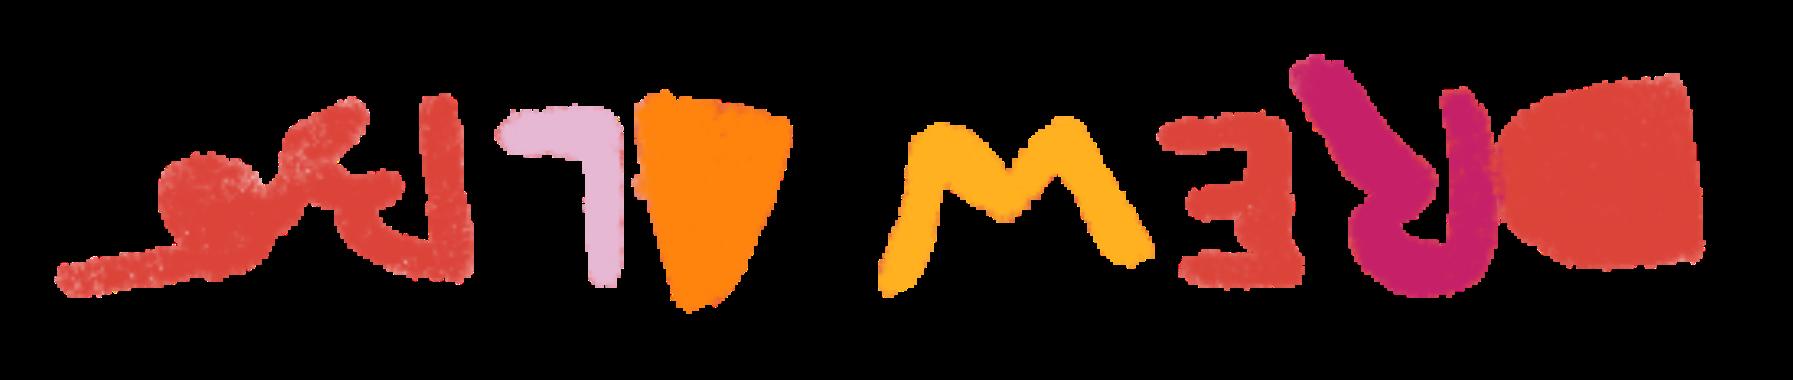 upsidedown logo.png